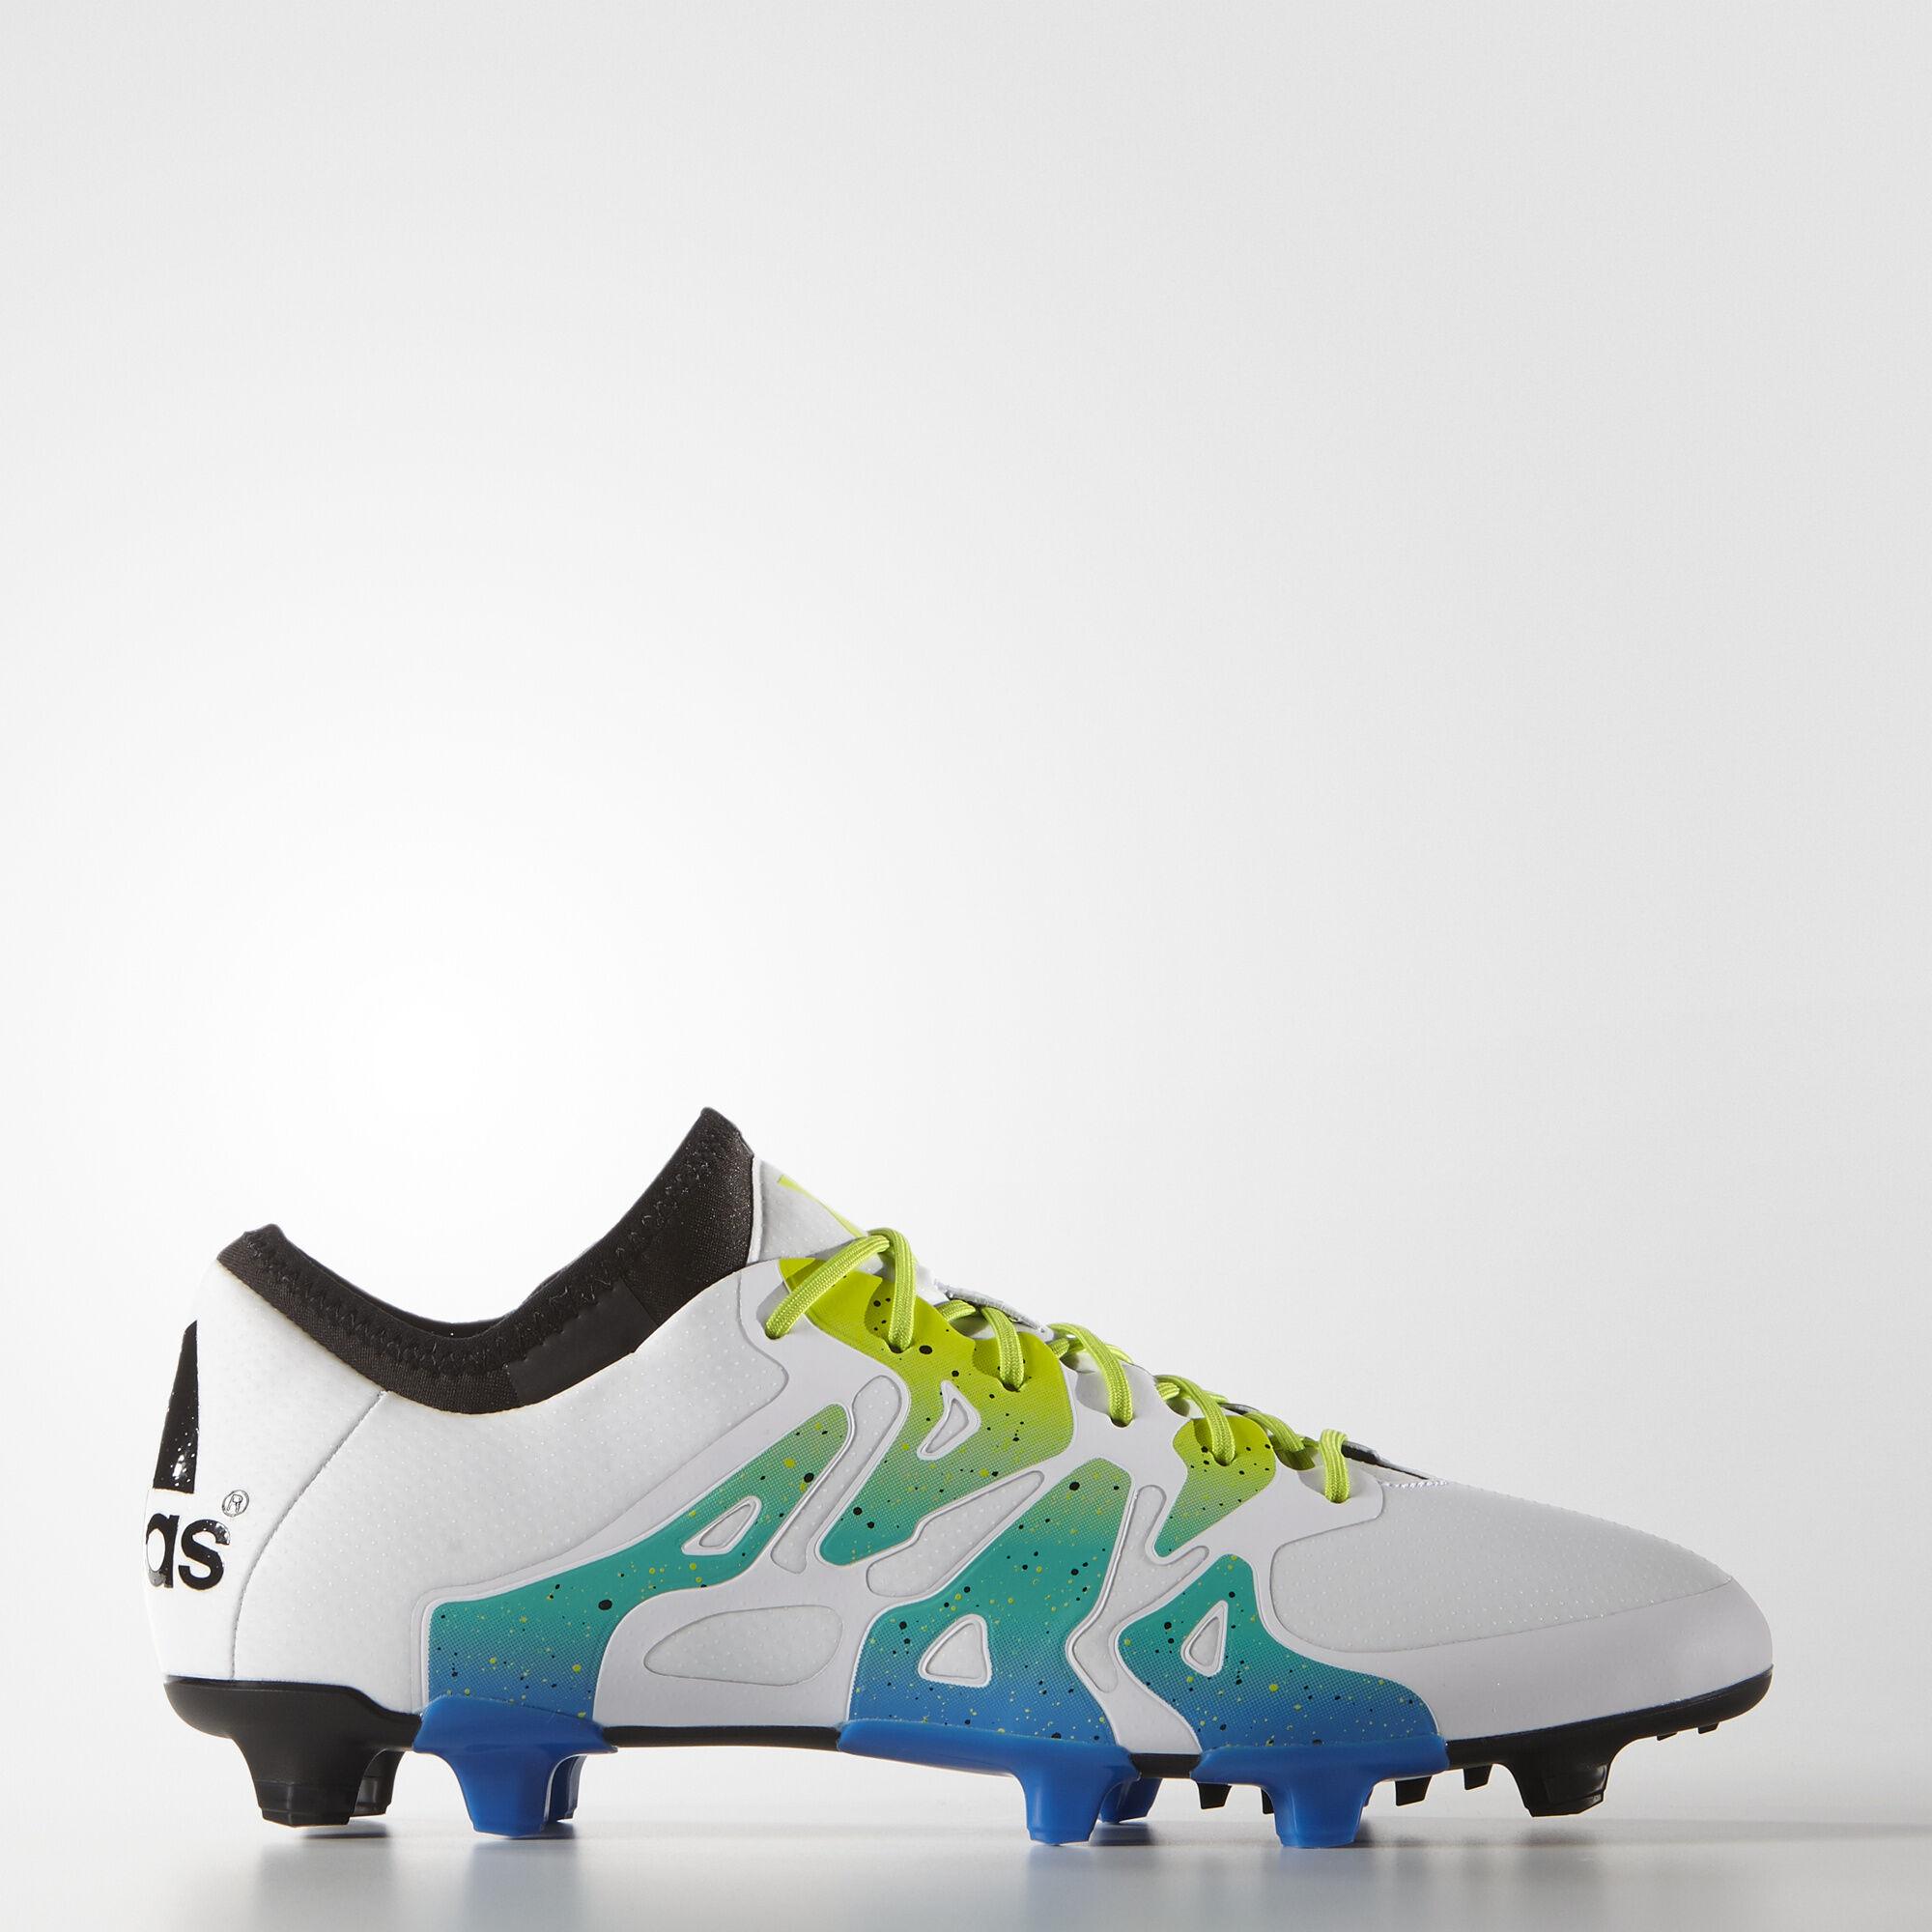 Adidas guayos para suelo firme c sped artificial x 15 1 - Cesped artificial colombia ...